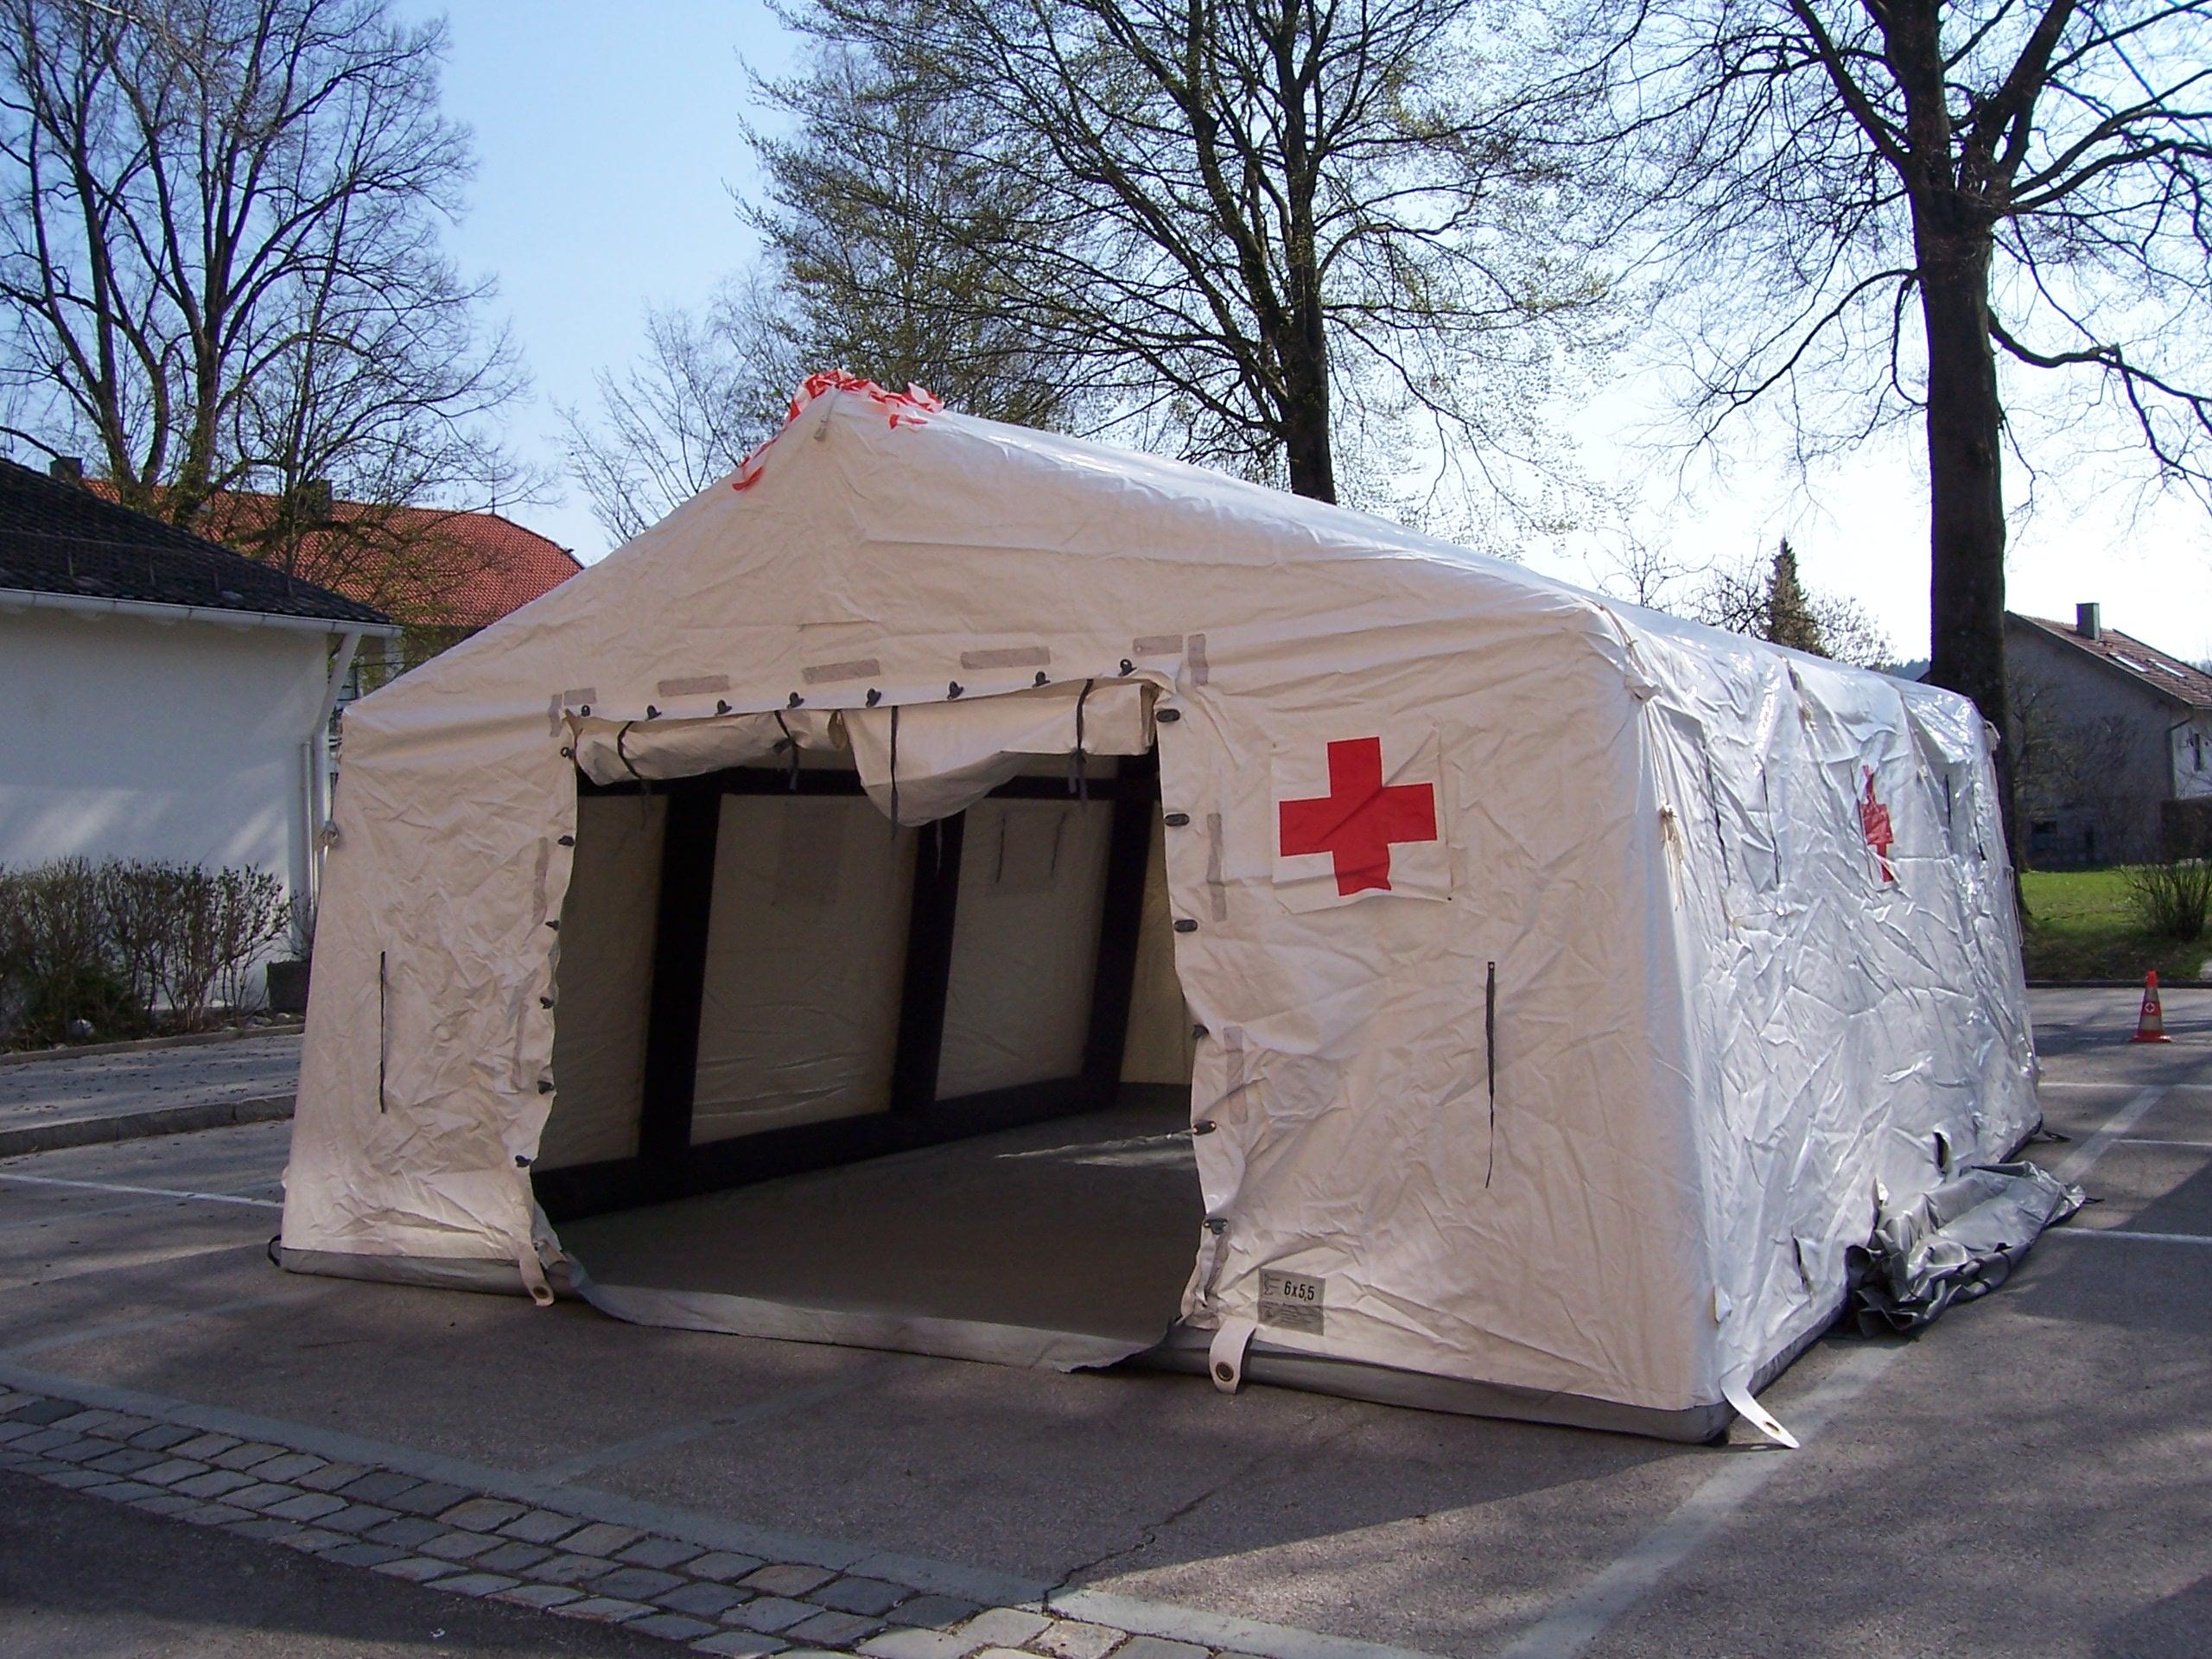 Zelt Auf Wohnmobilstellplatz : Sanitätszelt